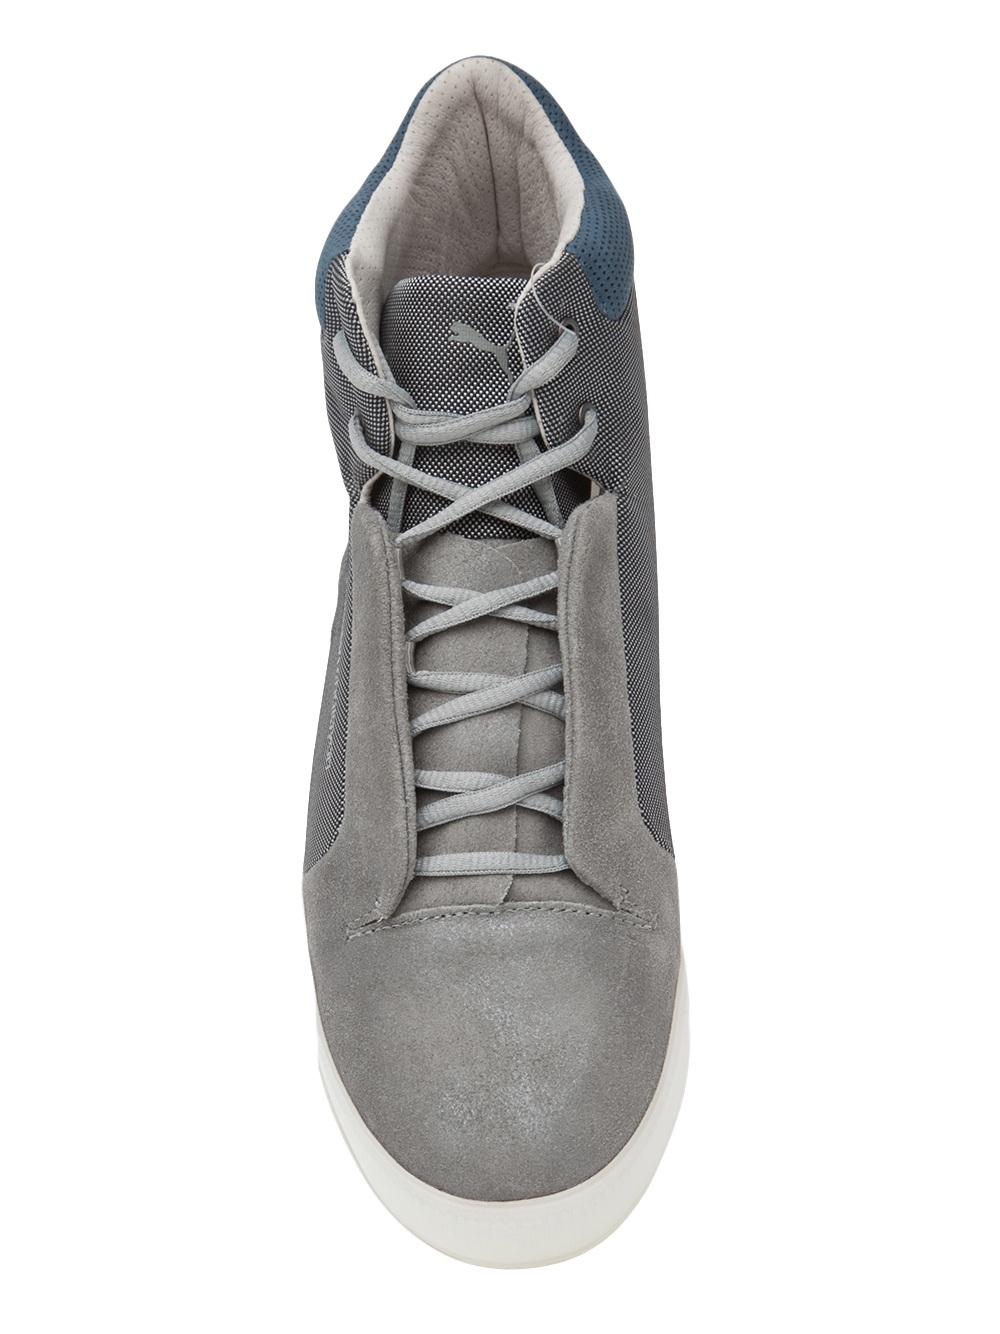 Puma Grey High Tops